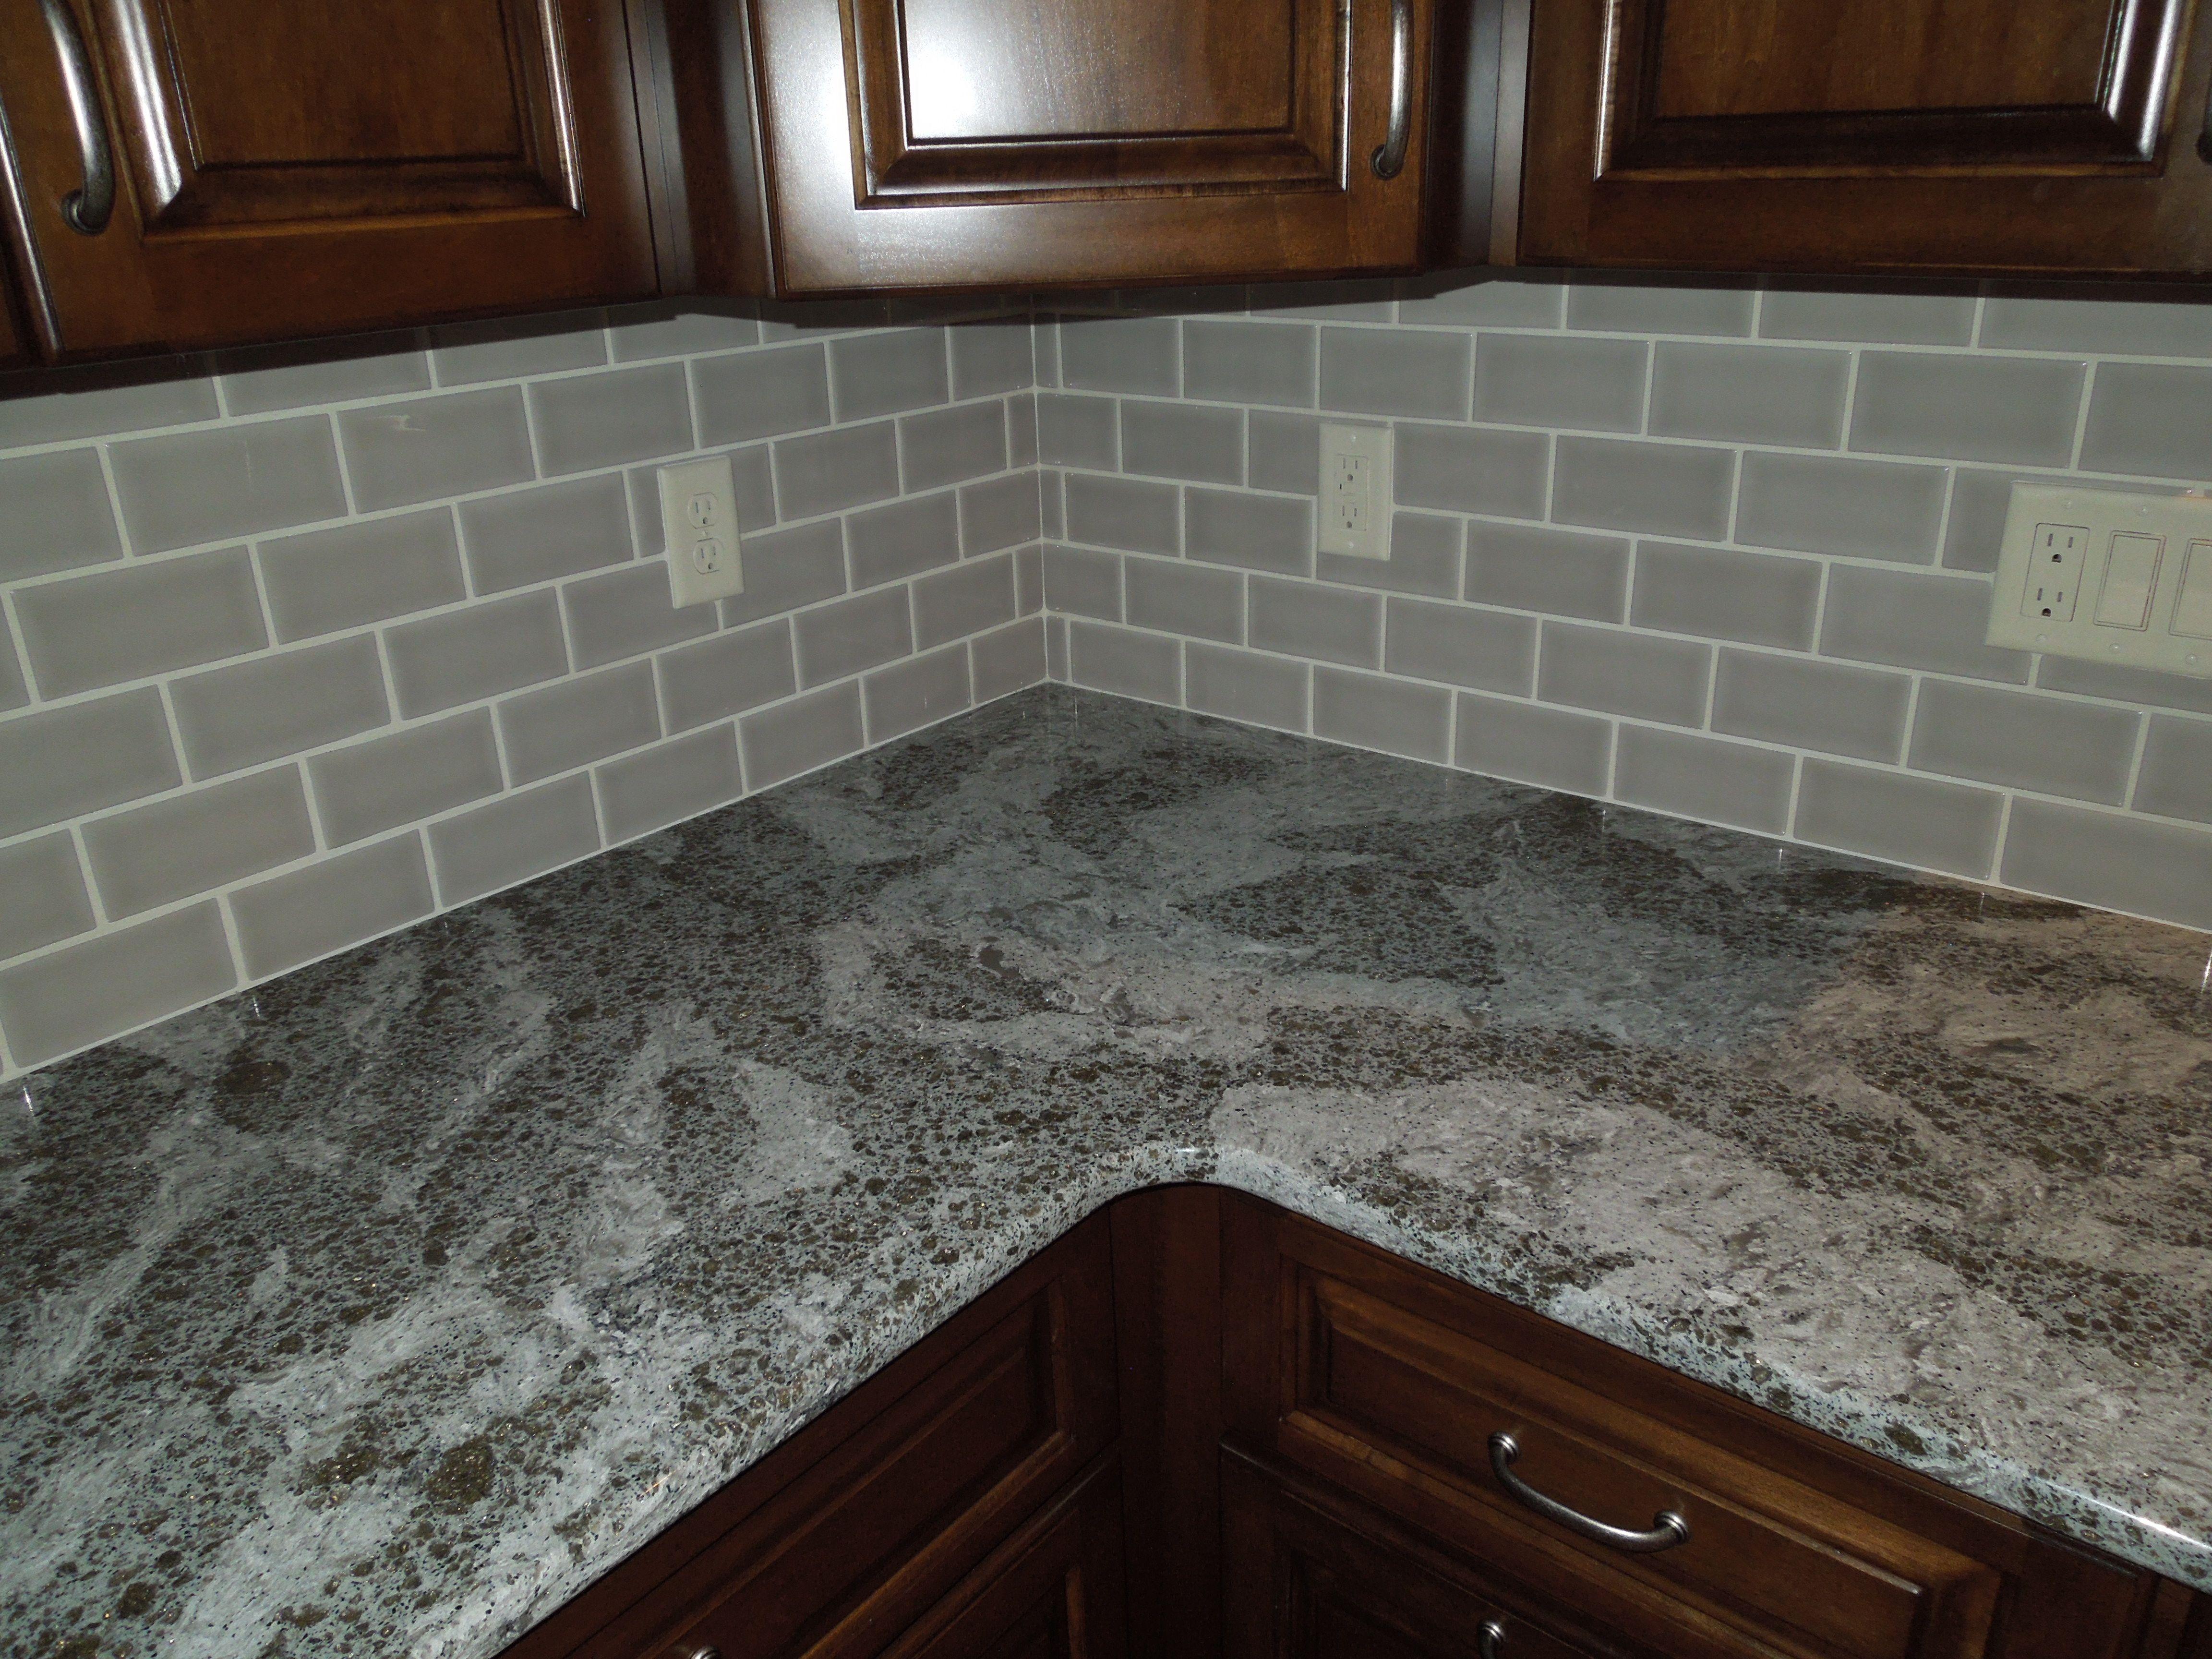 Arabesque Tile Backsplash Kitchen Back Splashes